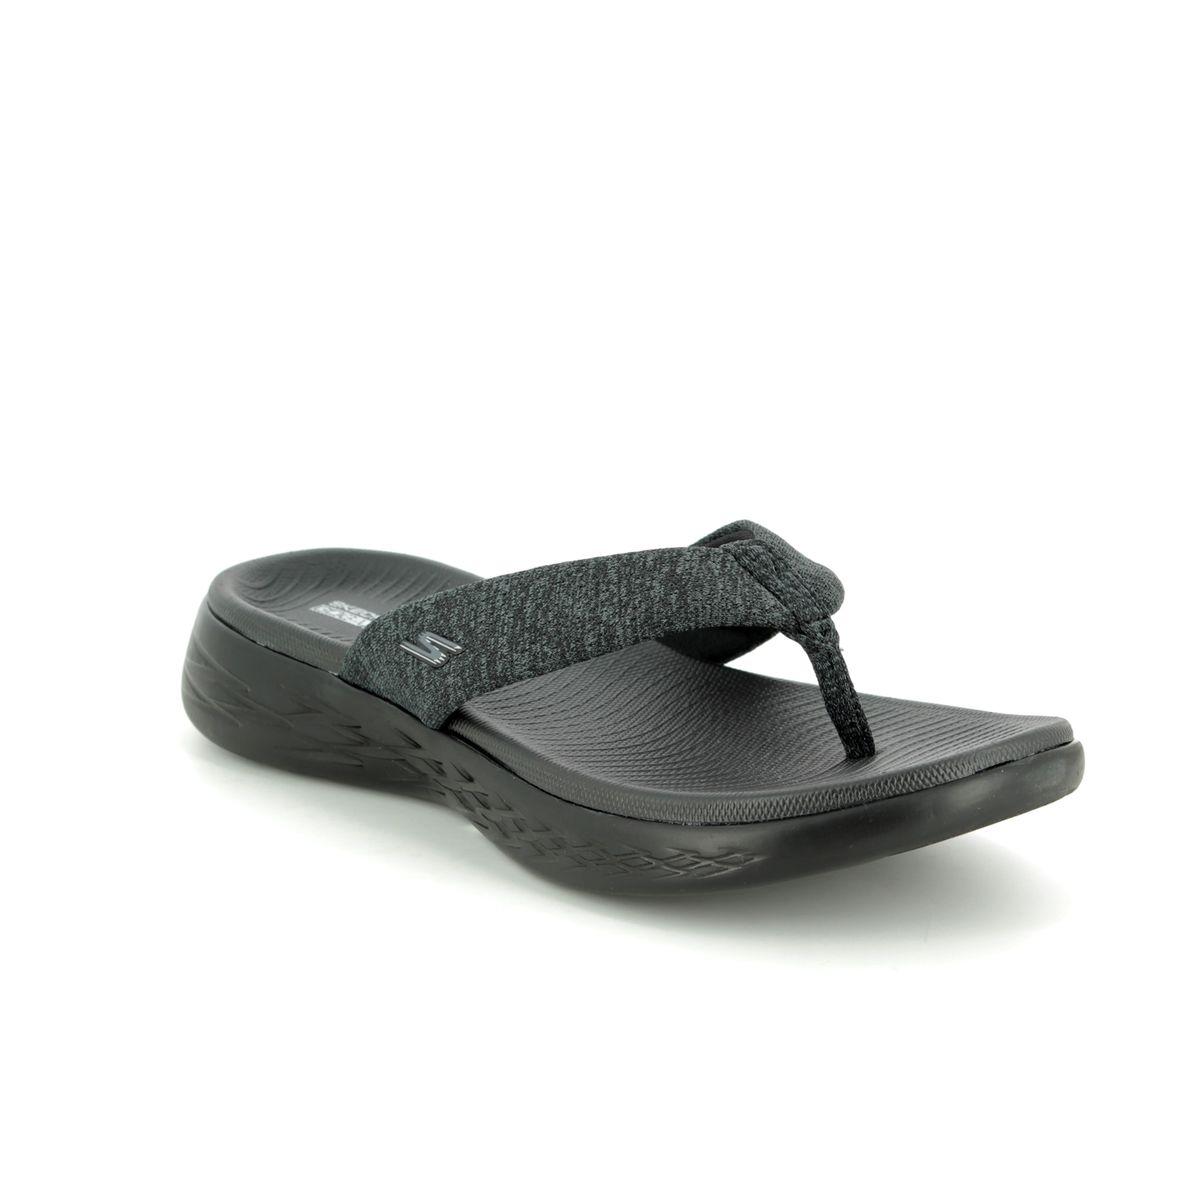 f24fb9ee8bc Skechers Preferred 15304 BBK Black Toe Post Sandals